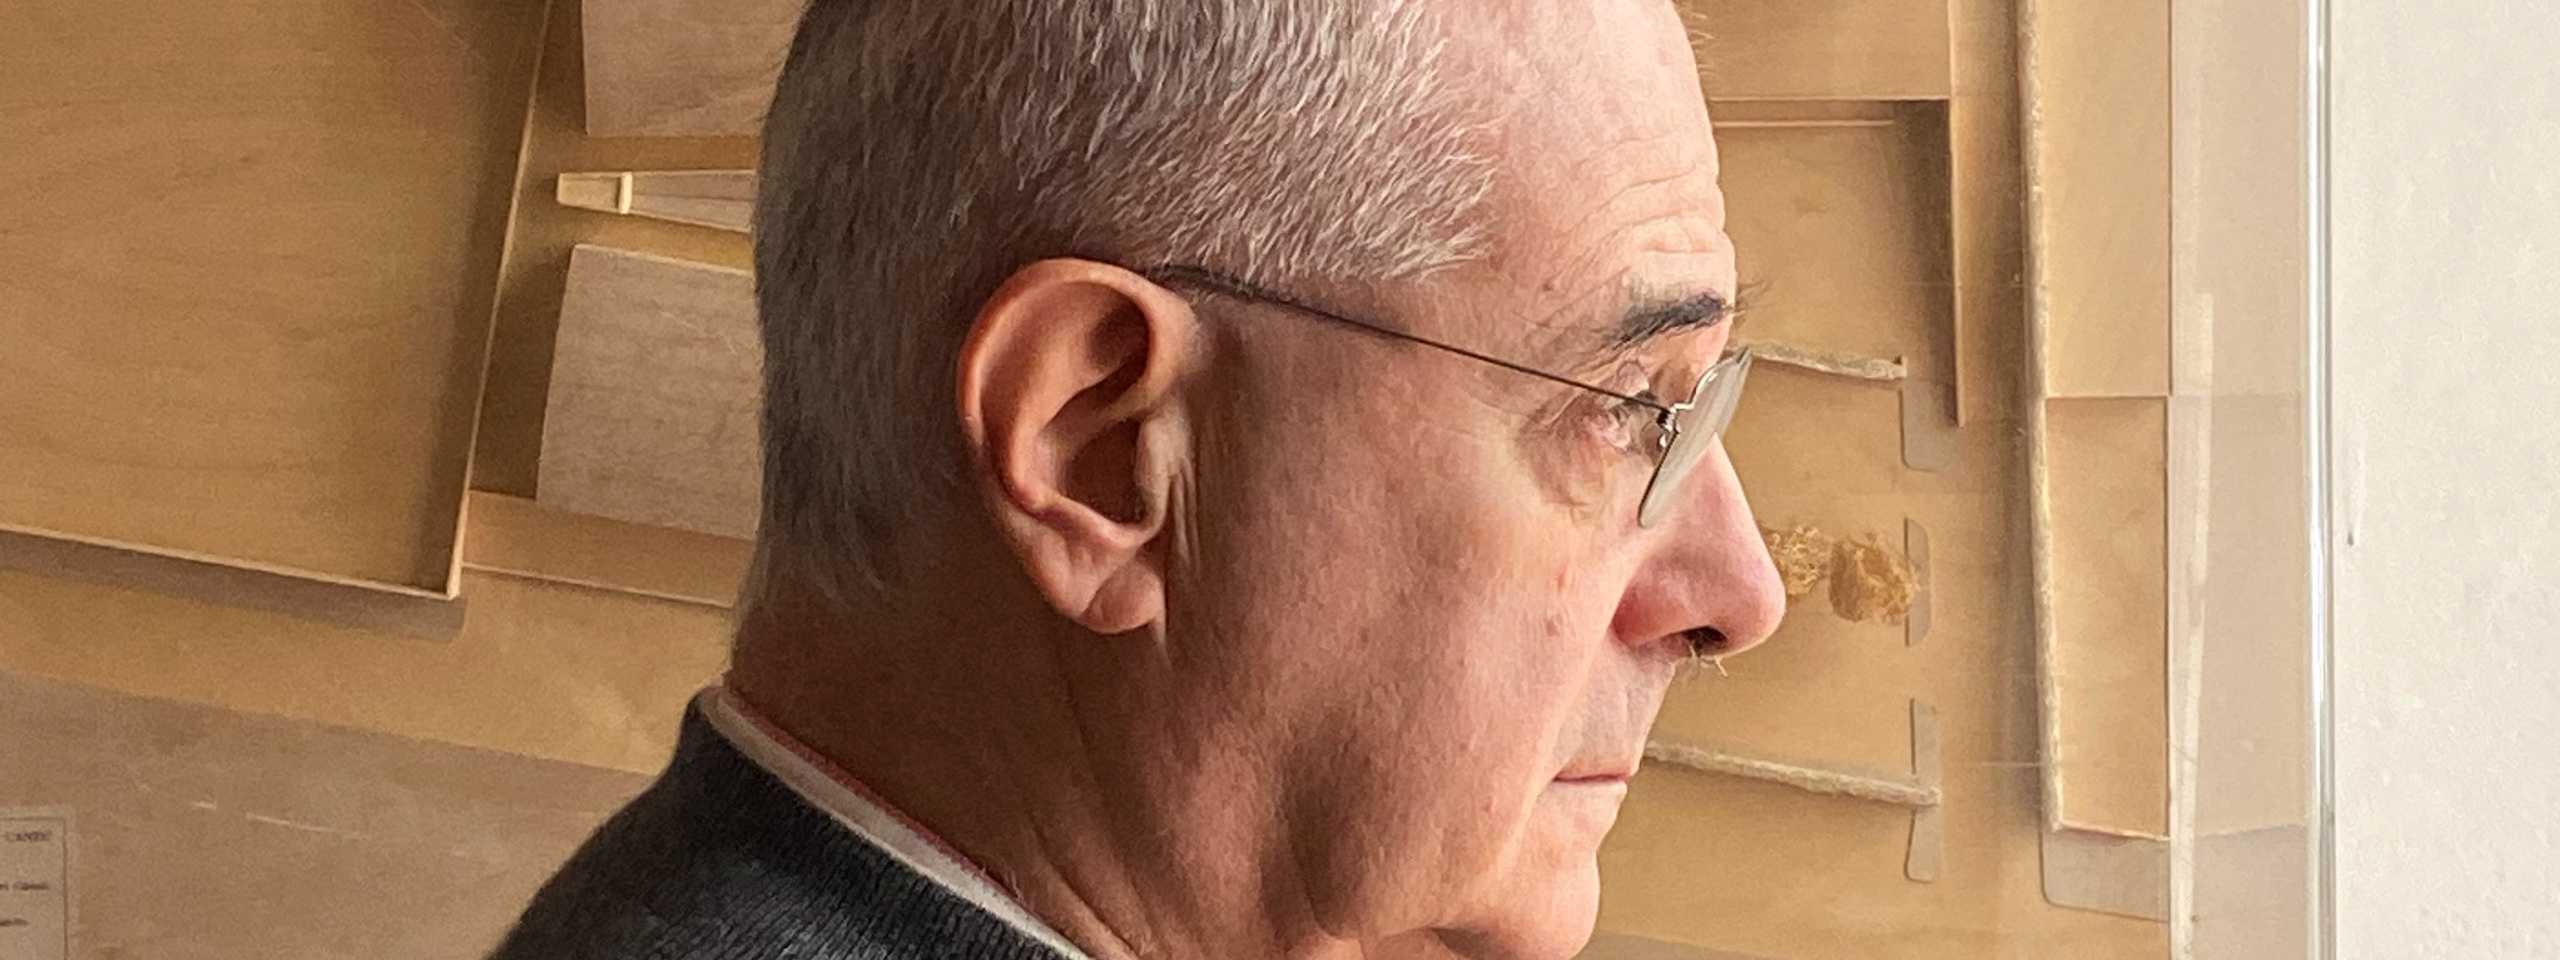 Mauro Galantino